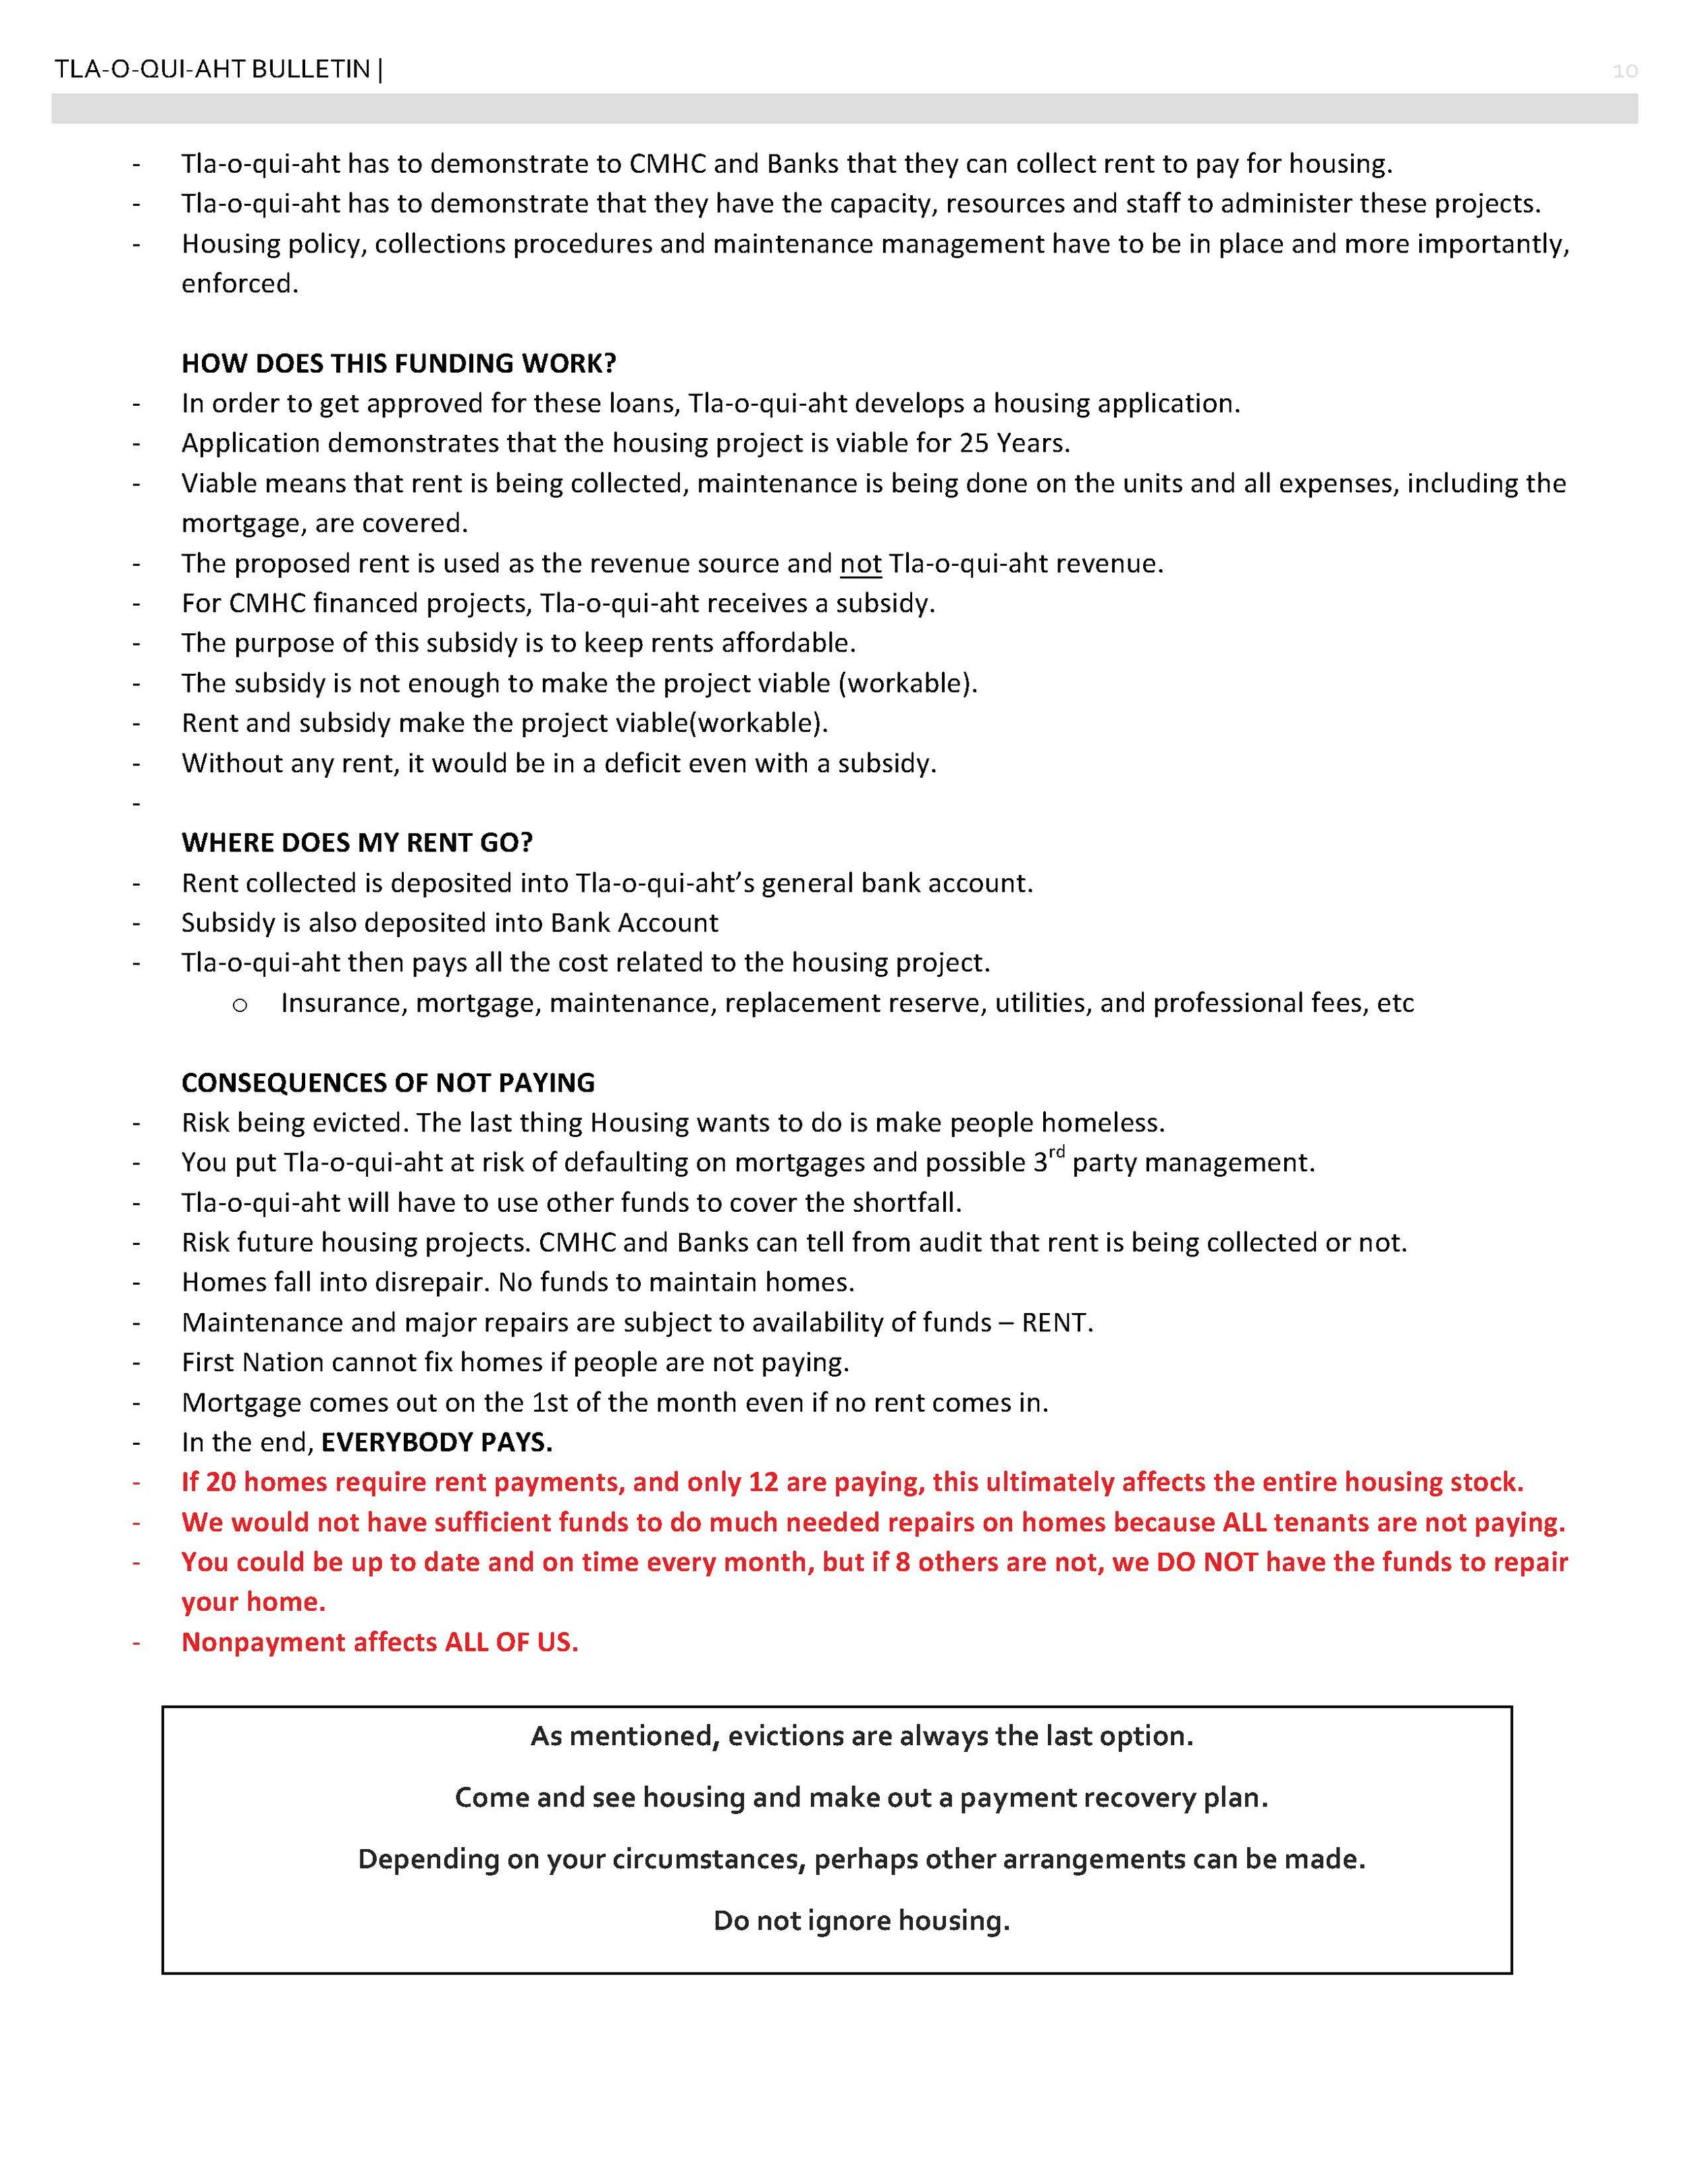 0TFN Bulletin Nov 15-2016_Page_10.jpg